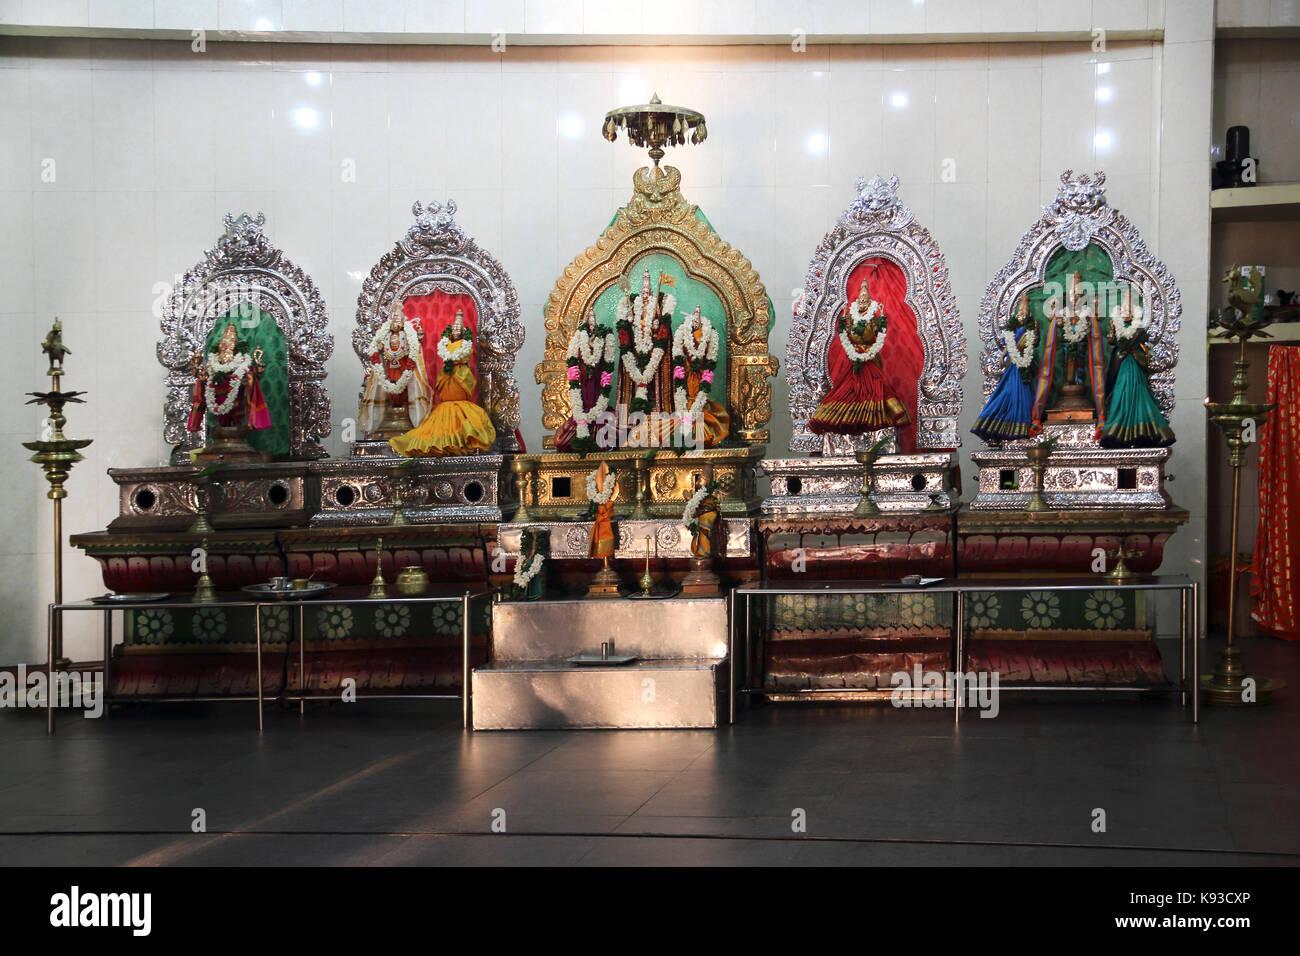 Pettah Colombo Sri Lanka New Kathiresan Kovil Temple Dedicated To War God Murugan Statue Of Hindu Gods Stock Photo